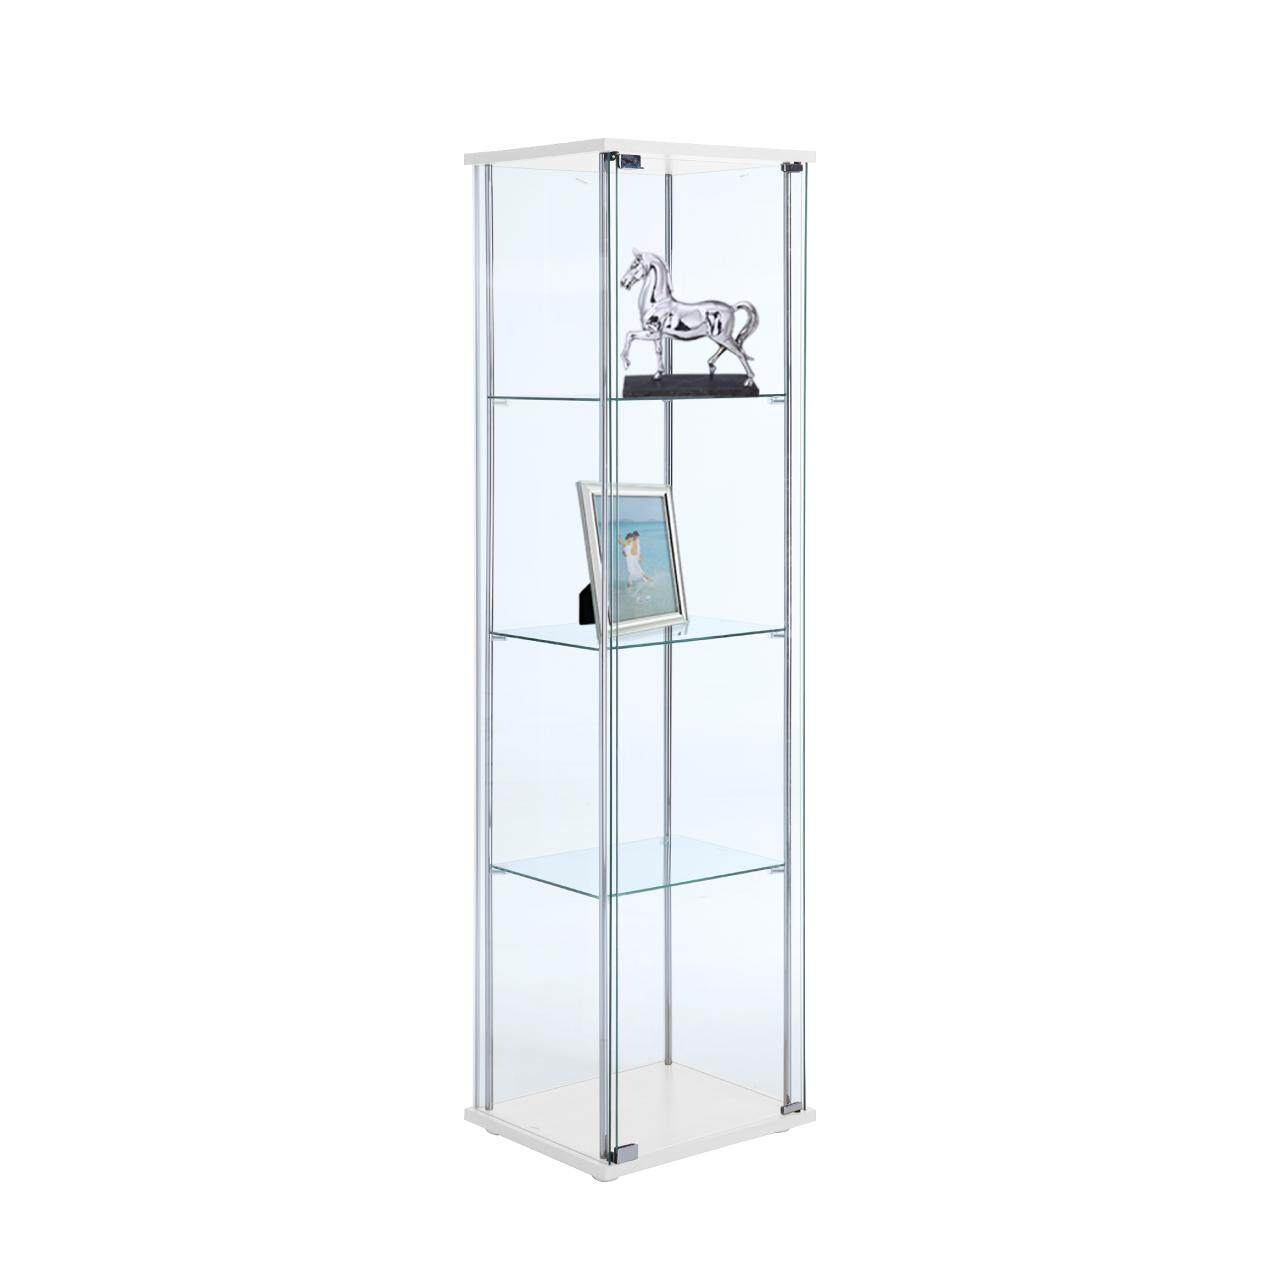 Winner Furniture ตู้โชว์กระจก รุ่น กลอรี่ 42.5 ซม. - สีขาว By Index Living Mall Official Store